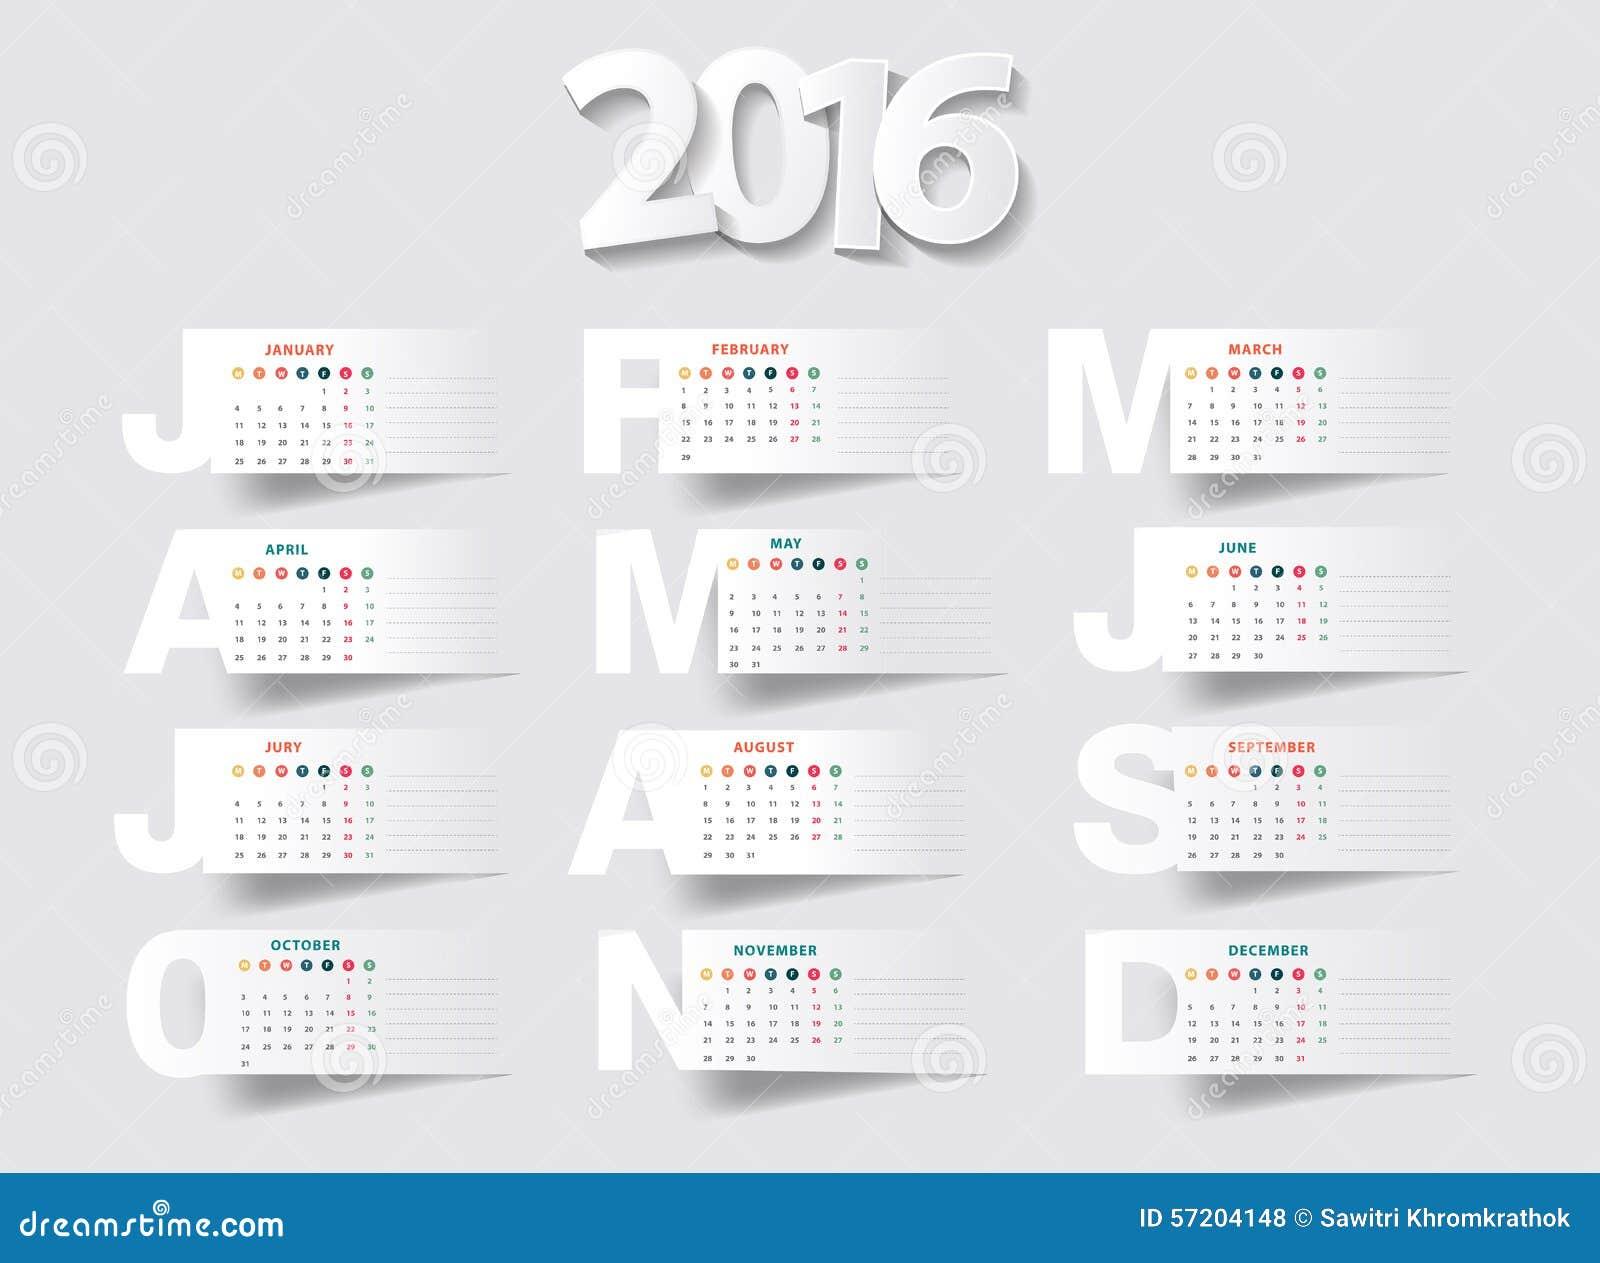 Calendar Design For New Year : Vector calendar new year stock image